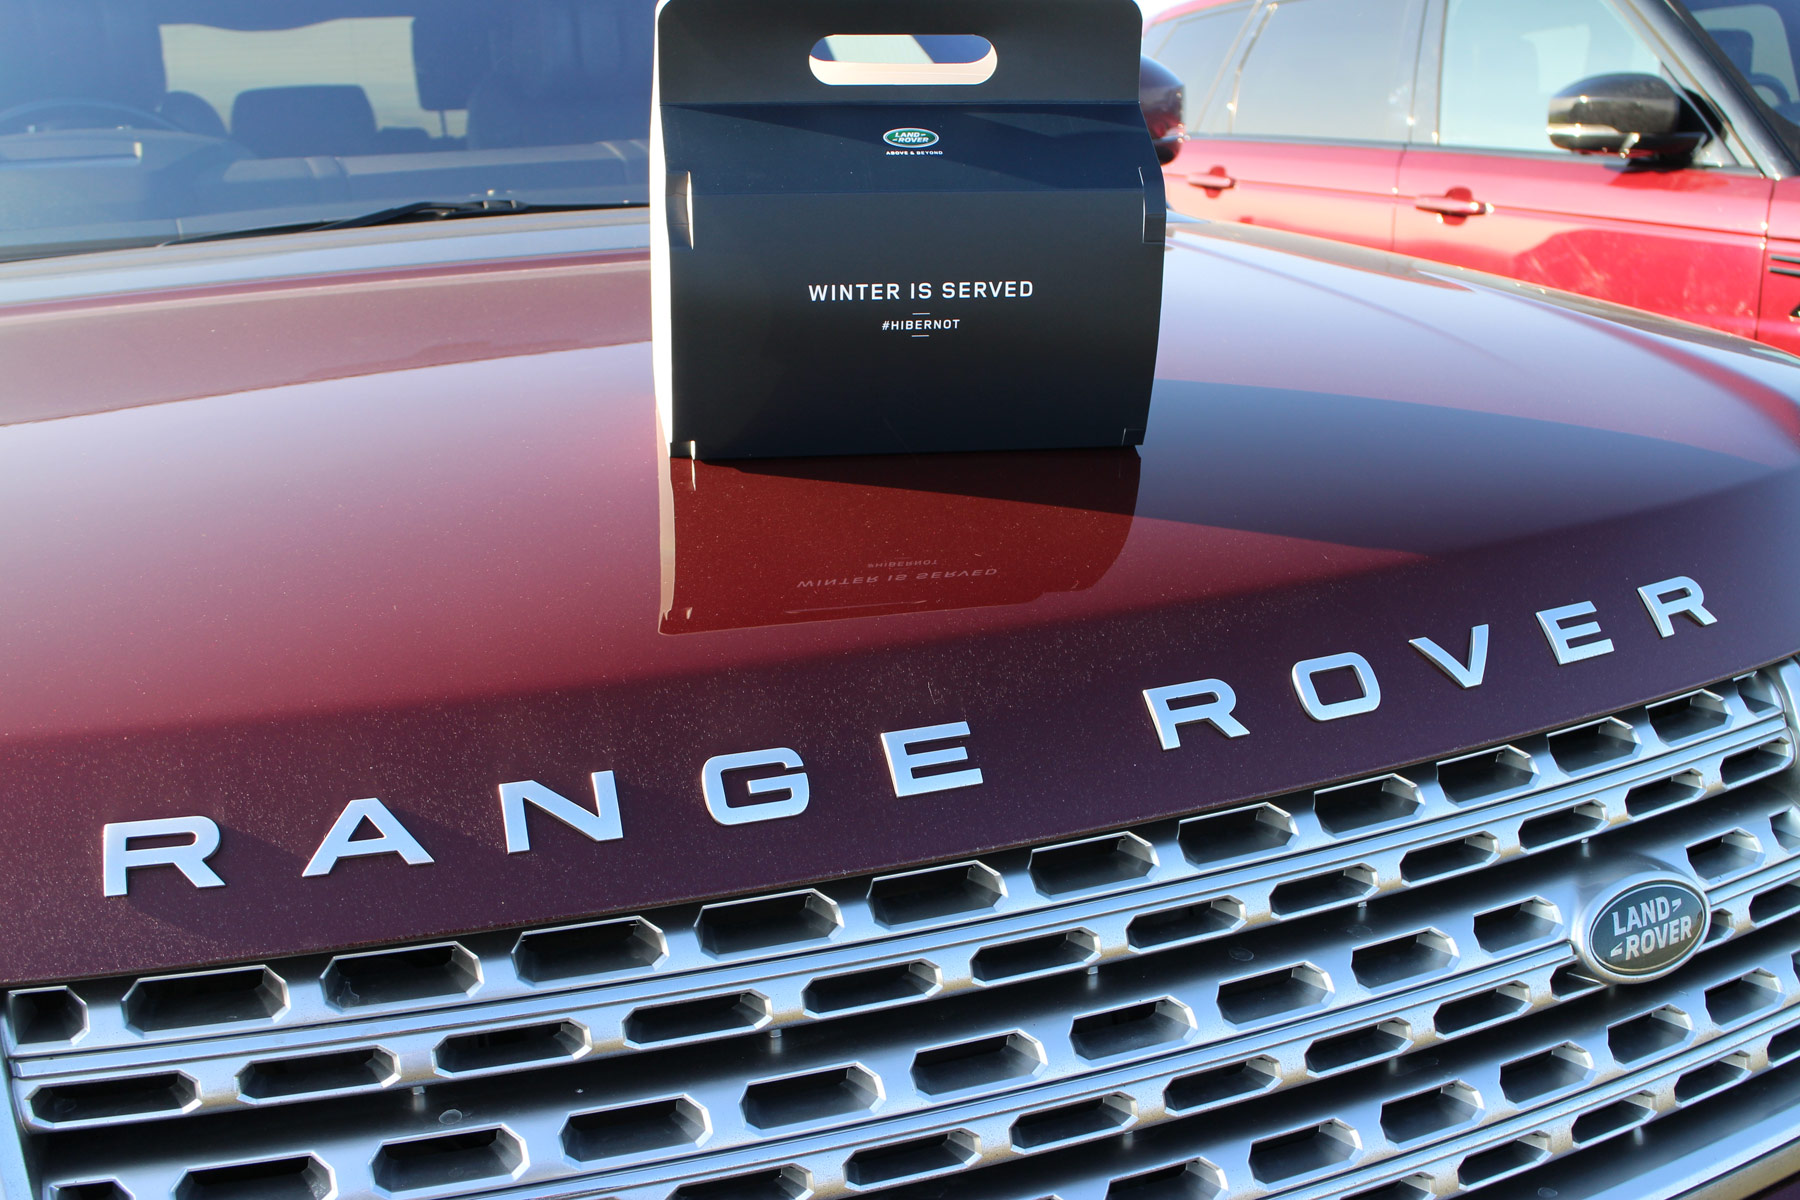 Land Rover & Chef Simon Rogan Create World's First Luxury Drive-Through 10